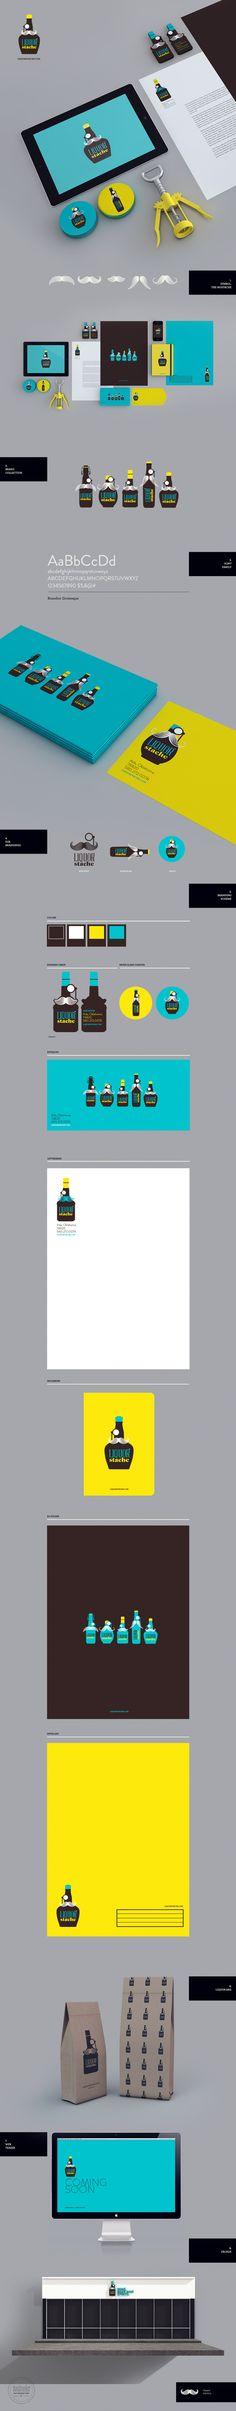 LiquorStache on Behance #identity #packaging #branding #marketing PD